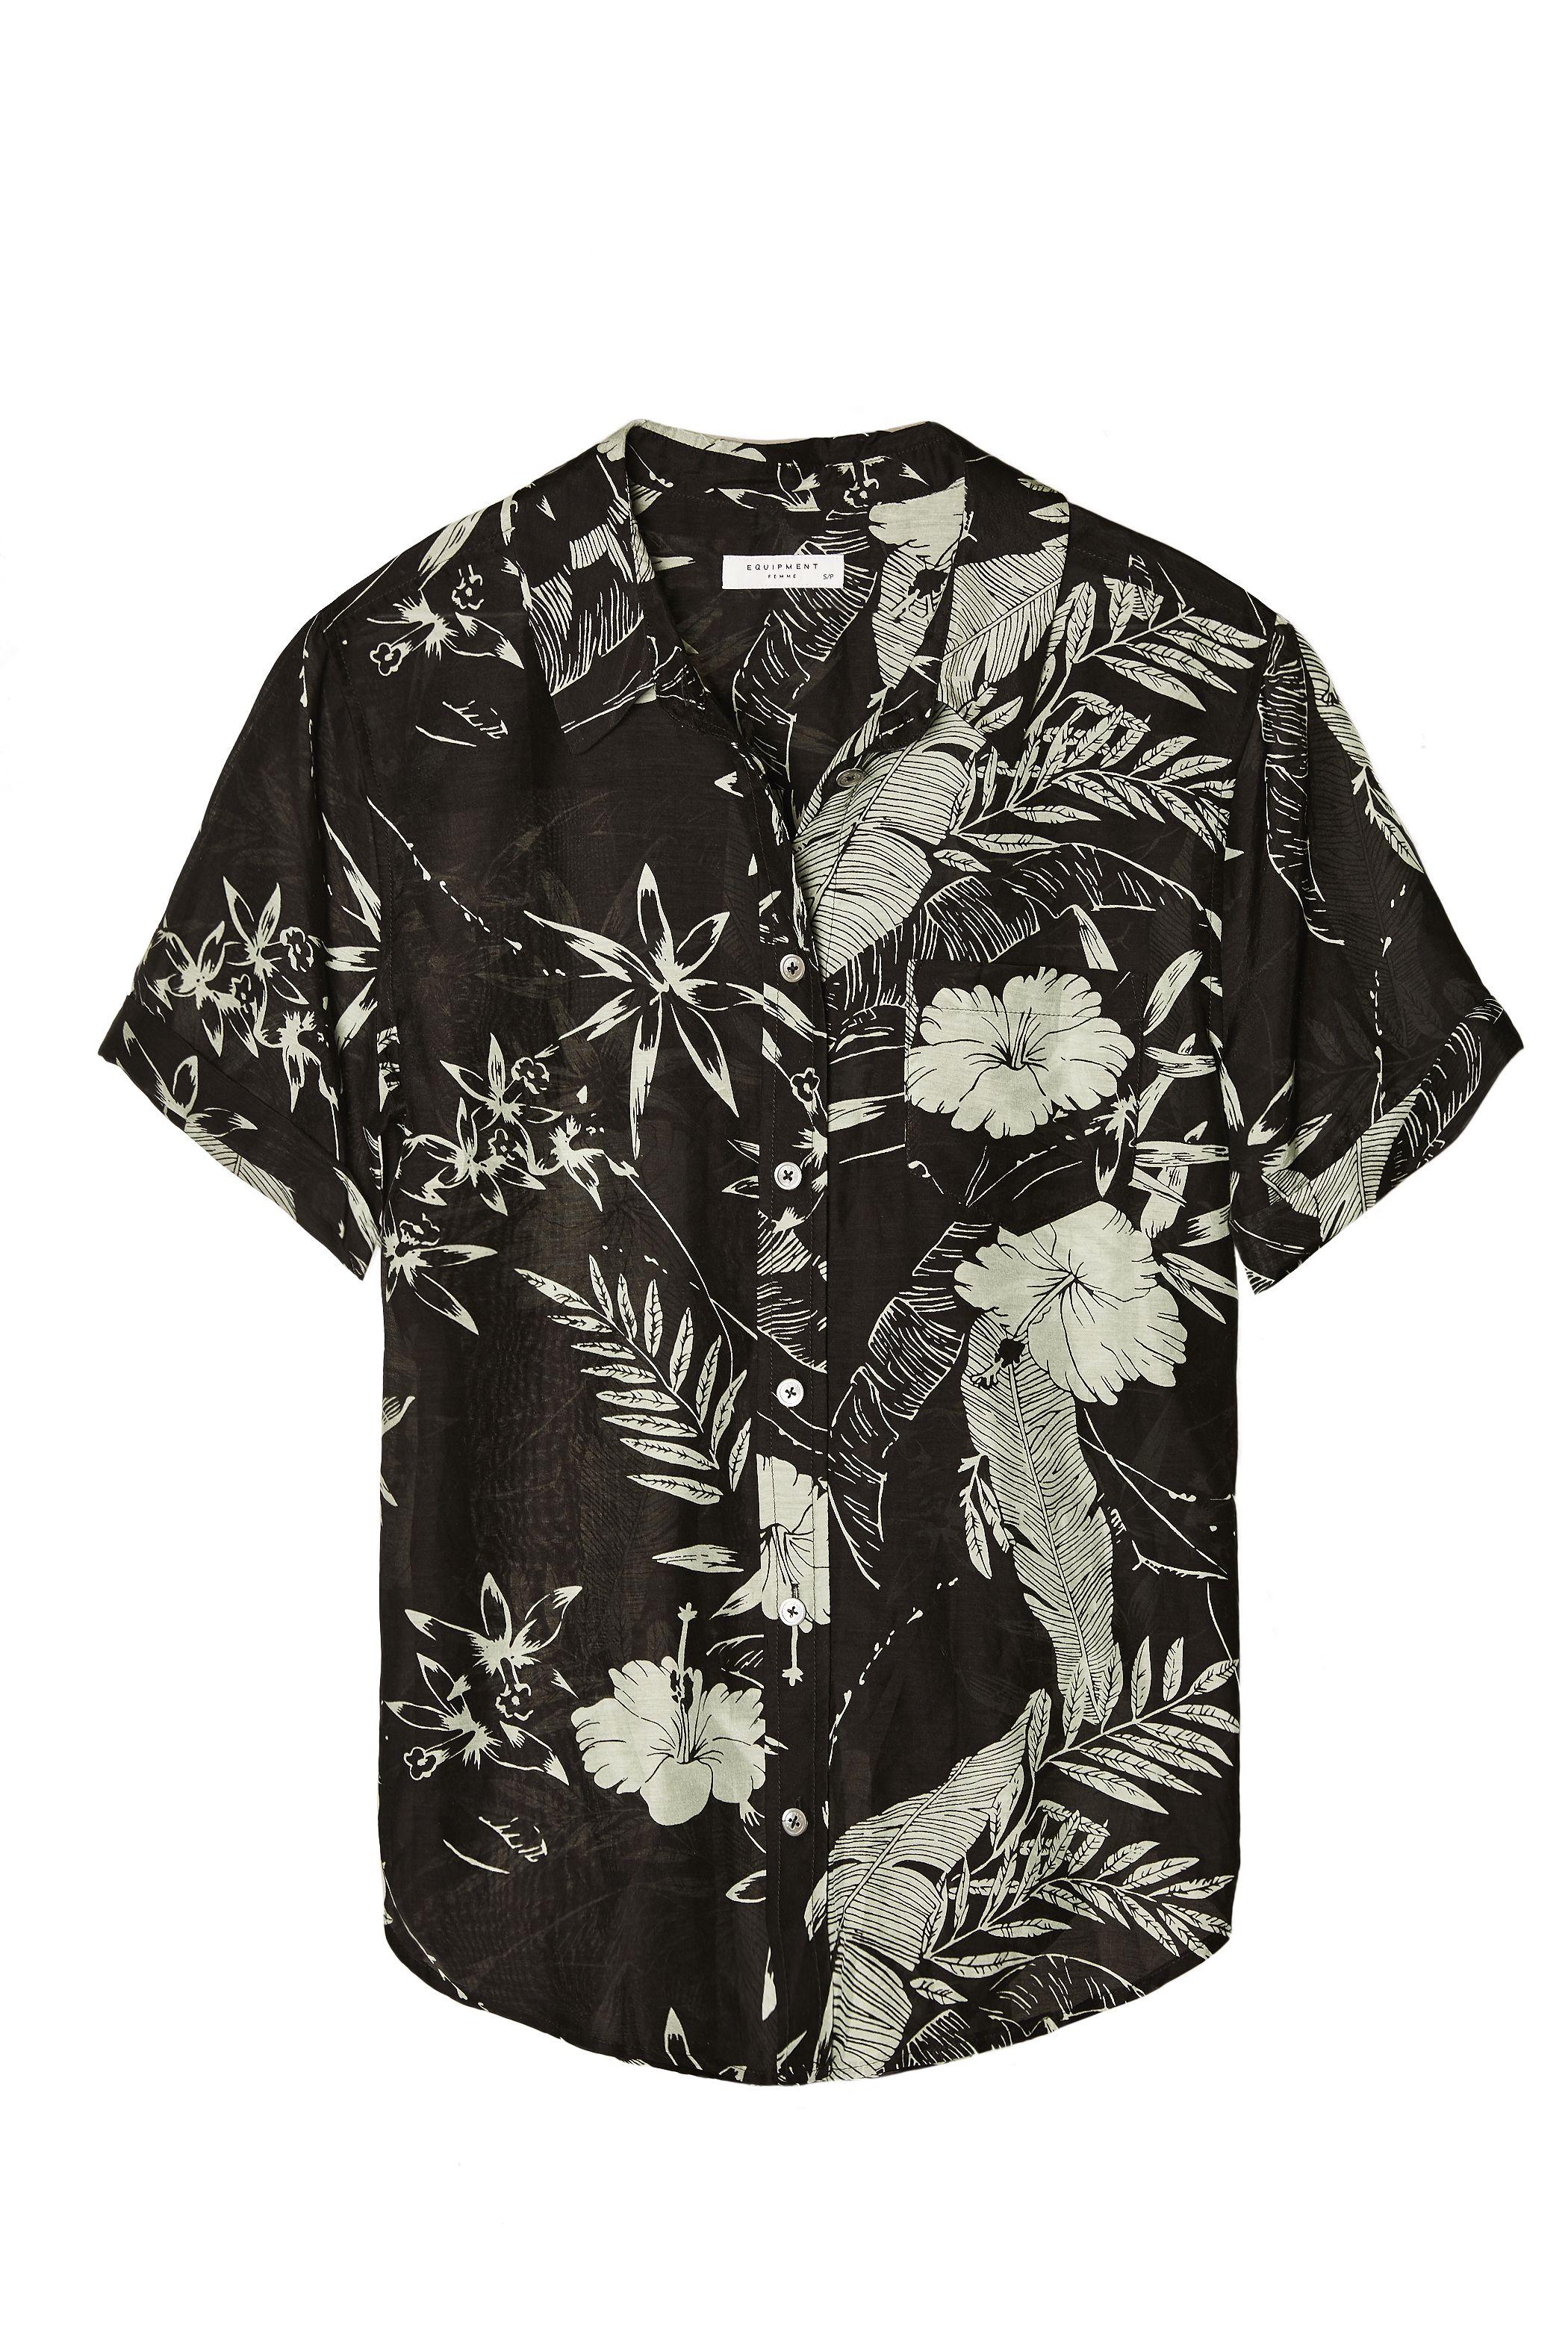 New Orleans Saints Hawaiian Shirts Summer Beach Holiday Short Sleeve T-Shirt Top